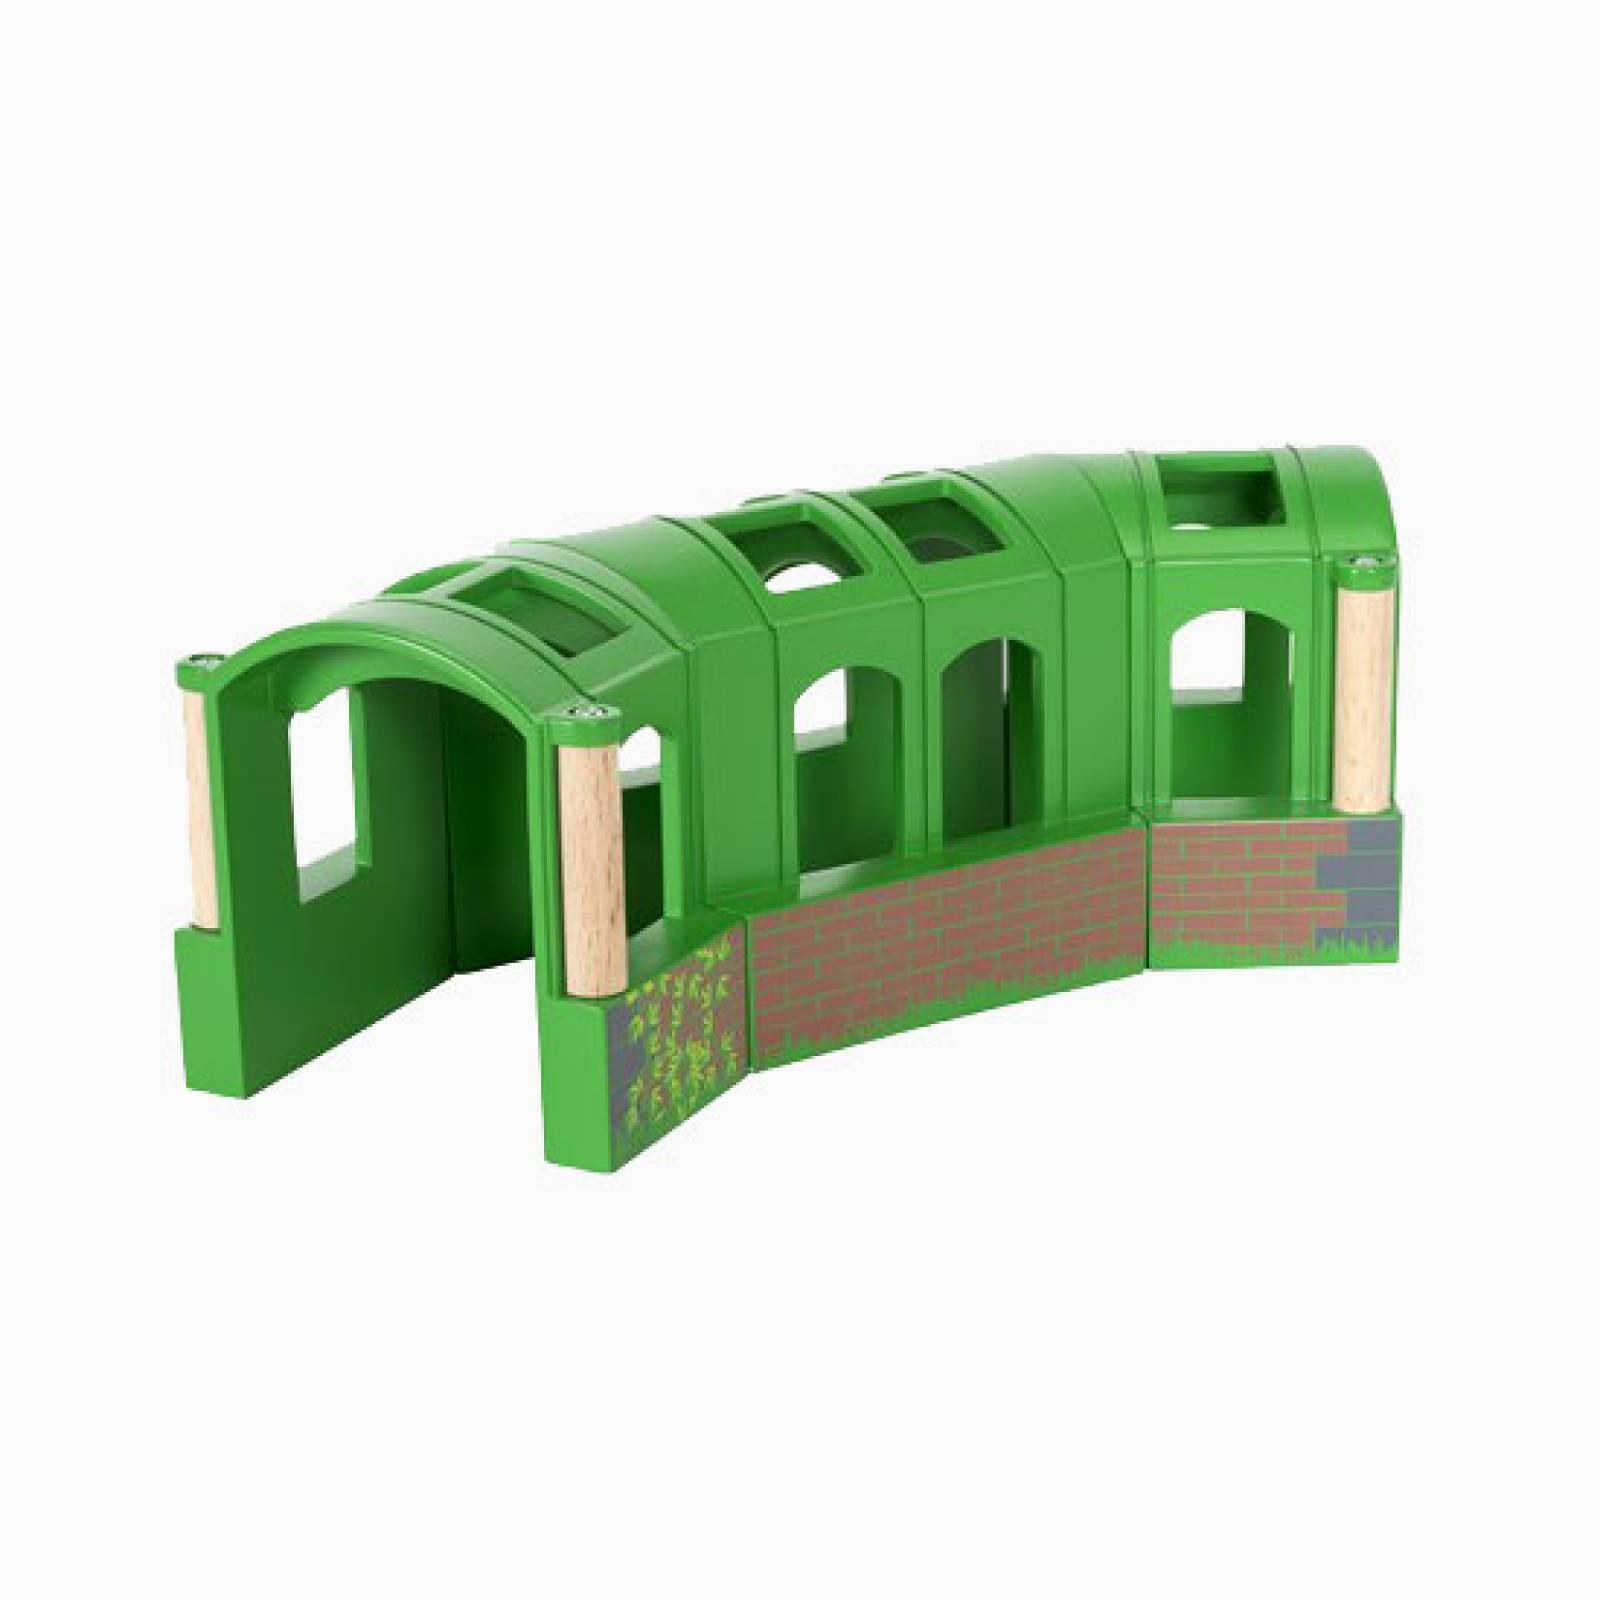 Flexible Tunnel BRIO Wooden Railway Age 3+ thumbnails